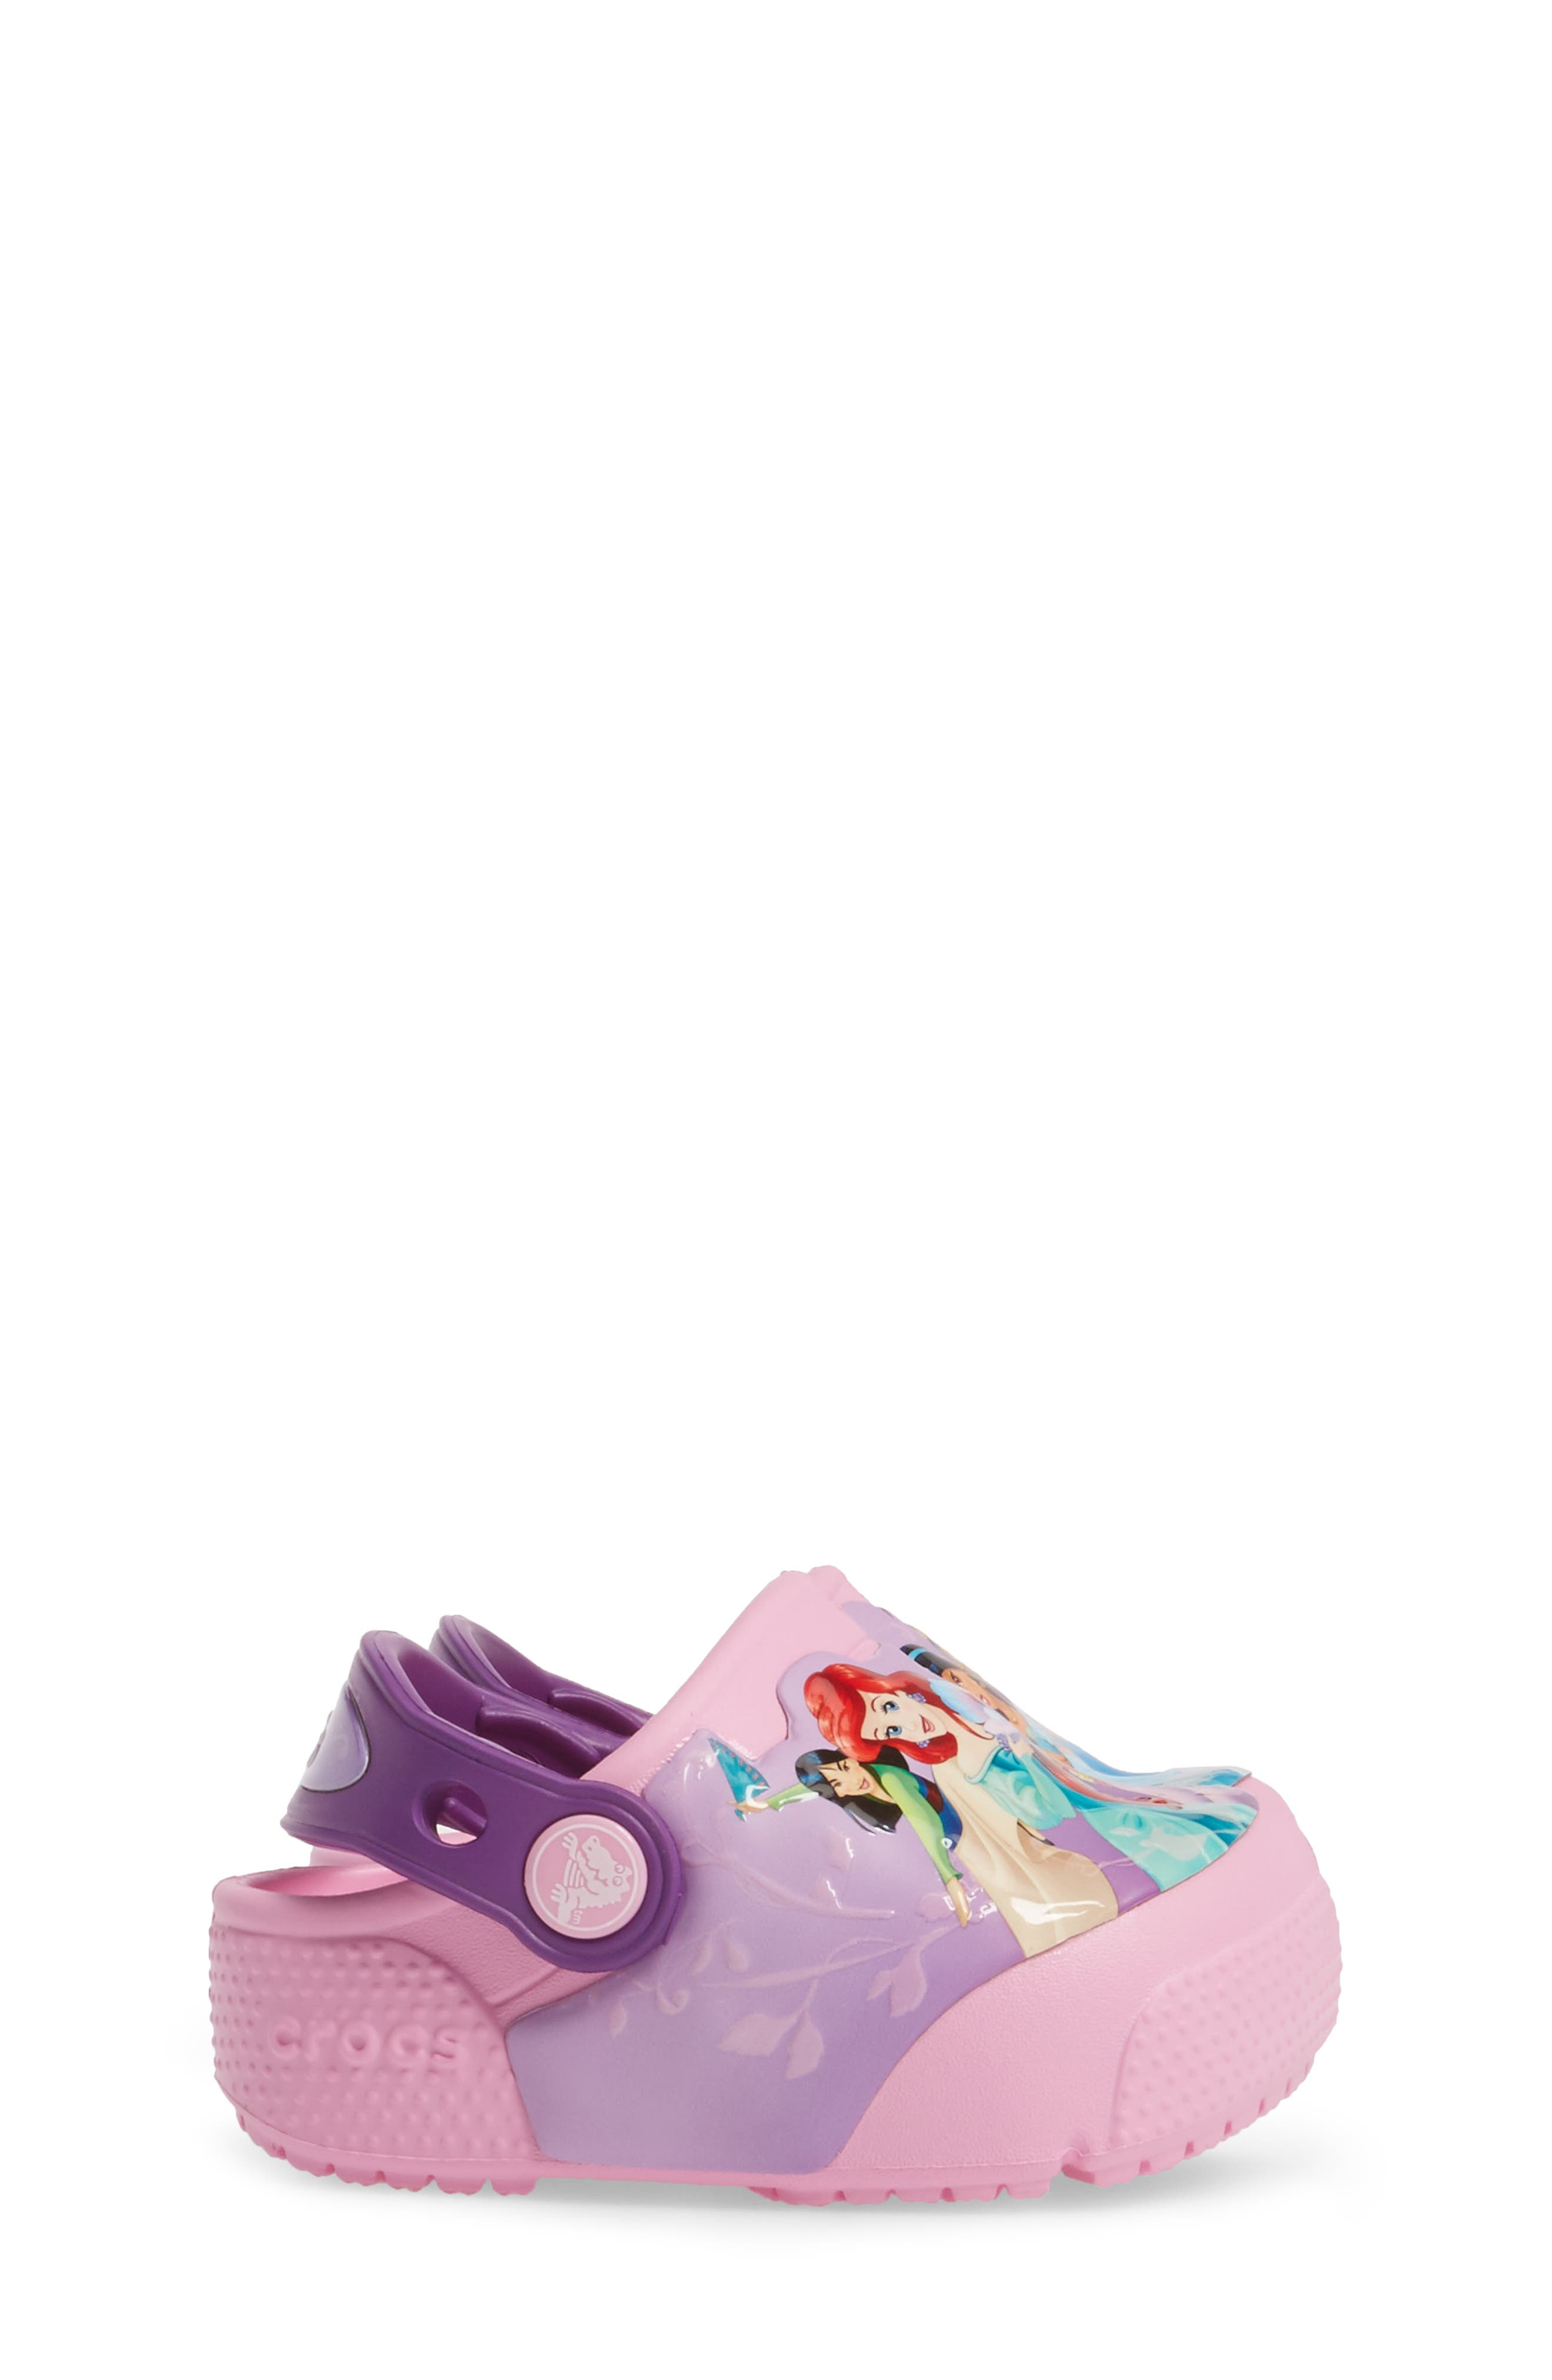 Fun ab Lights Disney<sup>®</sup> Princesses Light-Up Slip-On,                             Alternate thumbnail 3, color,                             570